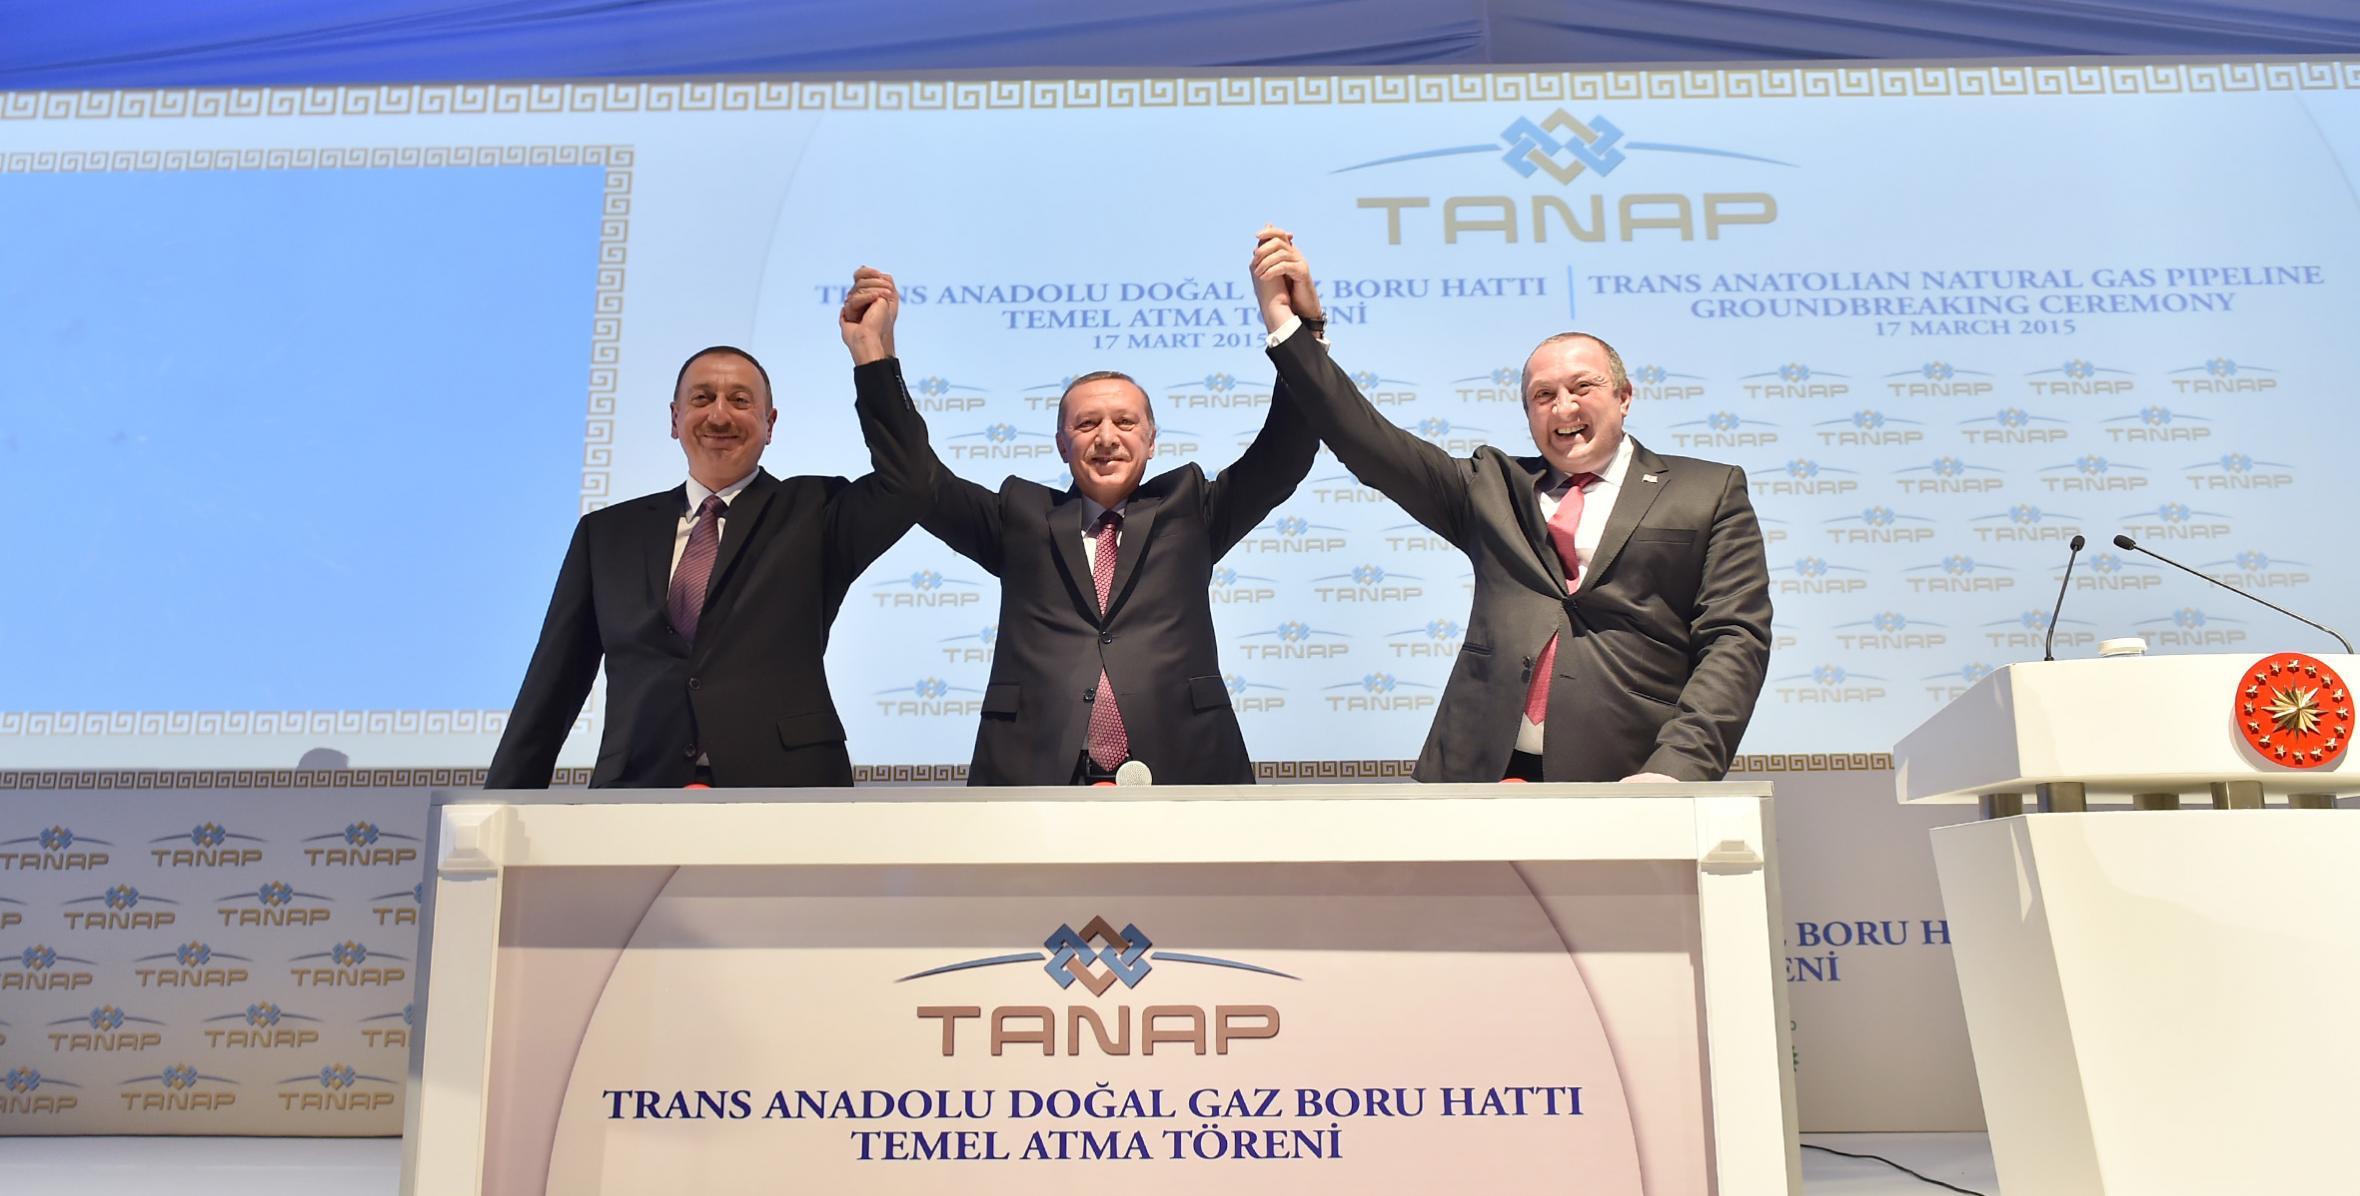 İlham Əliyev TANAP ile ilgili görsel sonucu